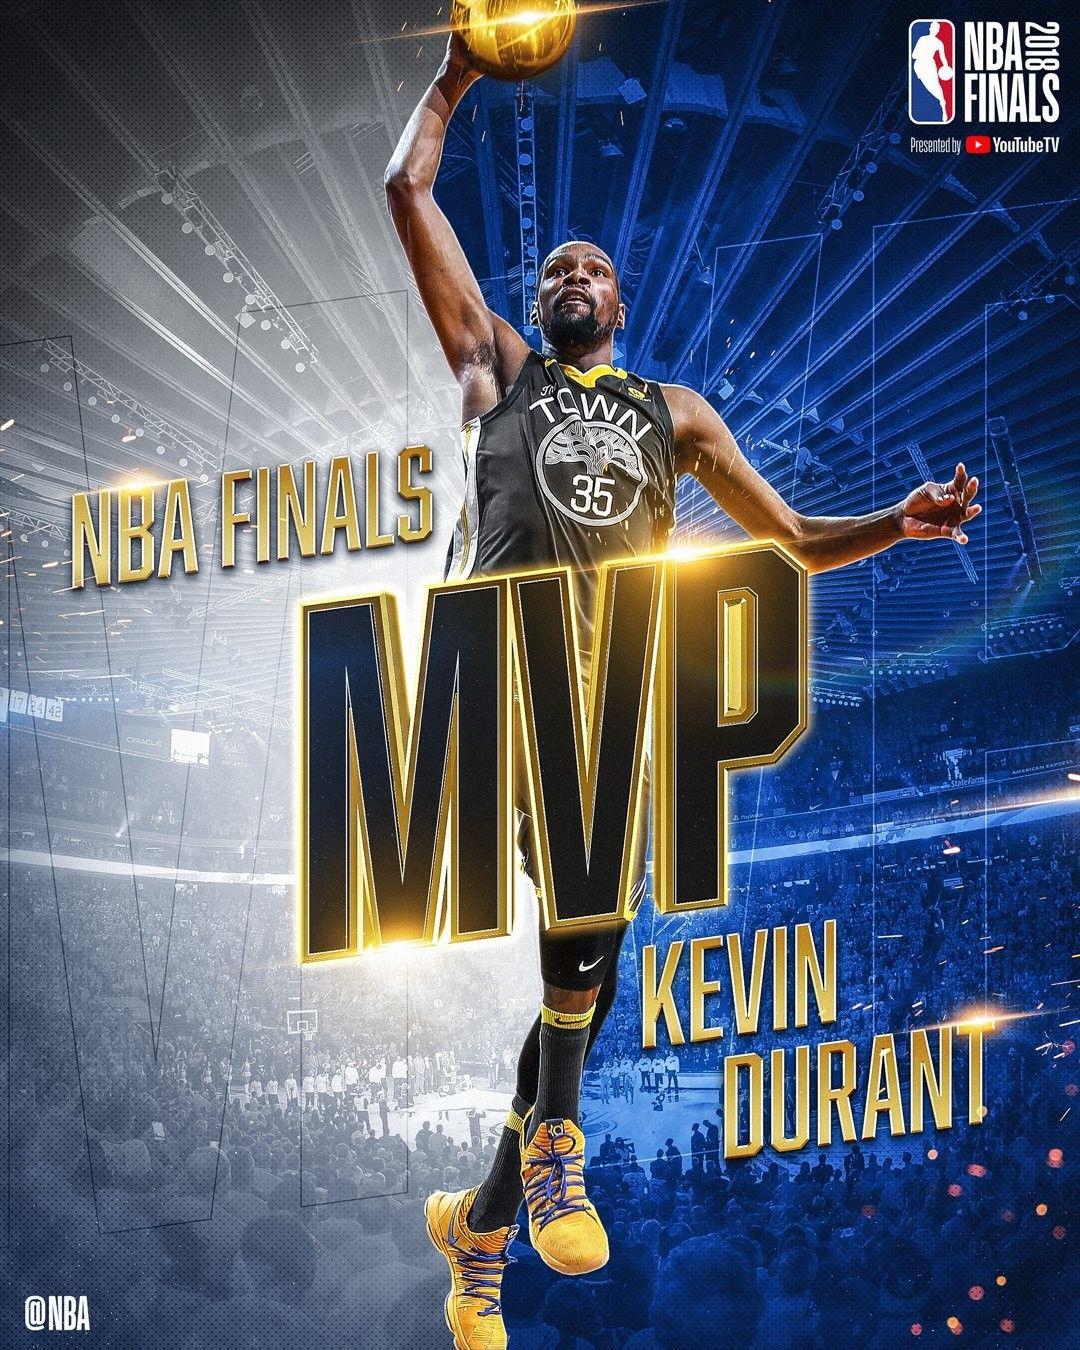 Pin by Brandon on NBA Nba finals, Nba finals 2018, Nba mvp